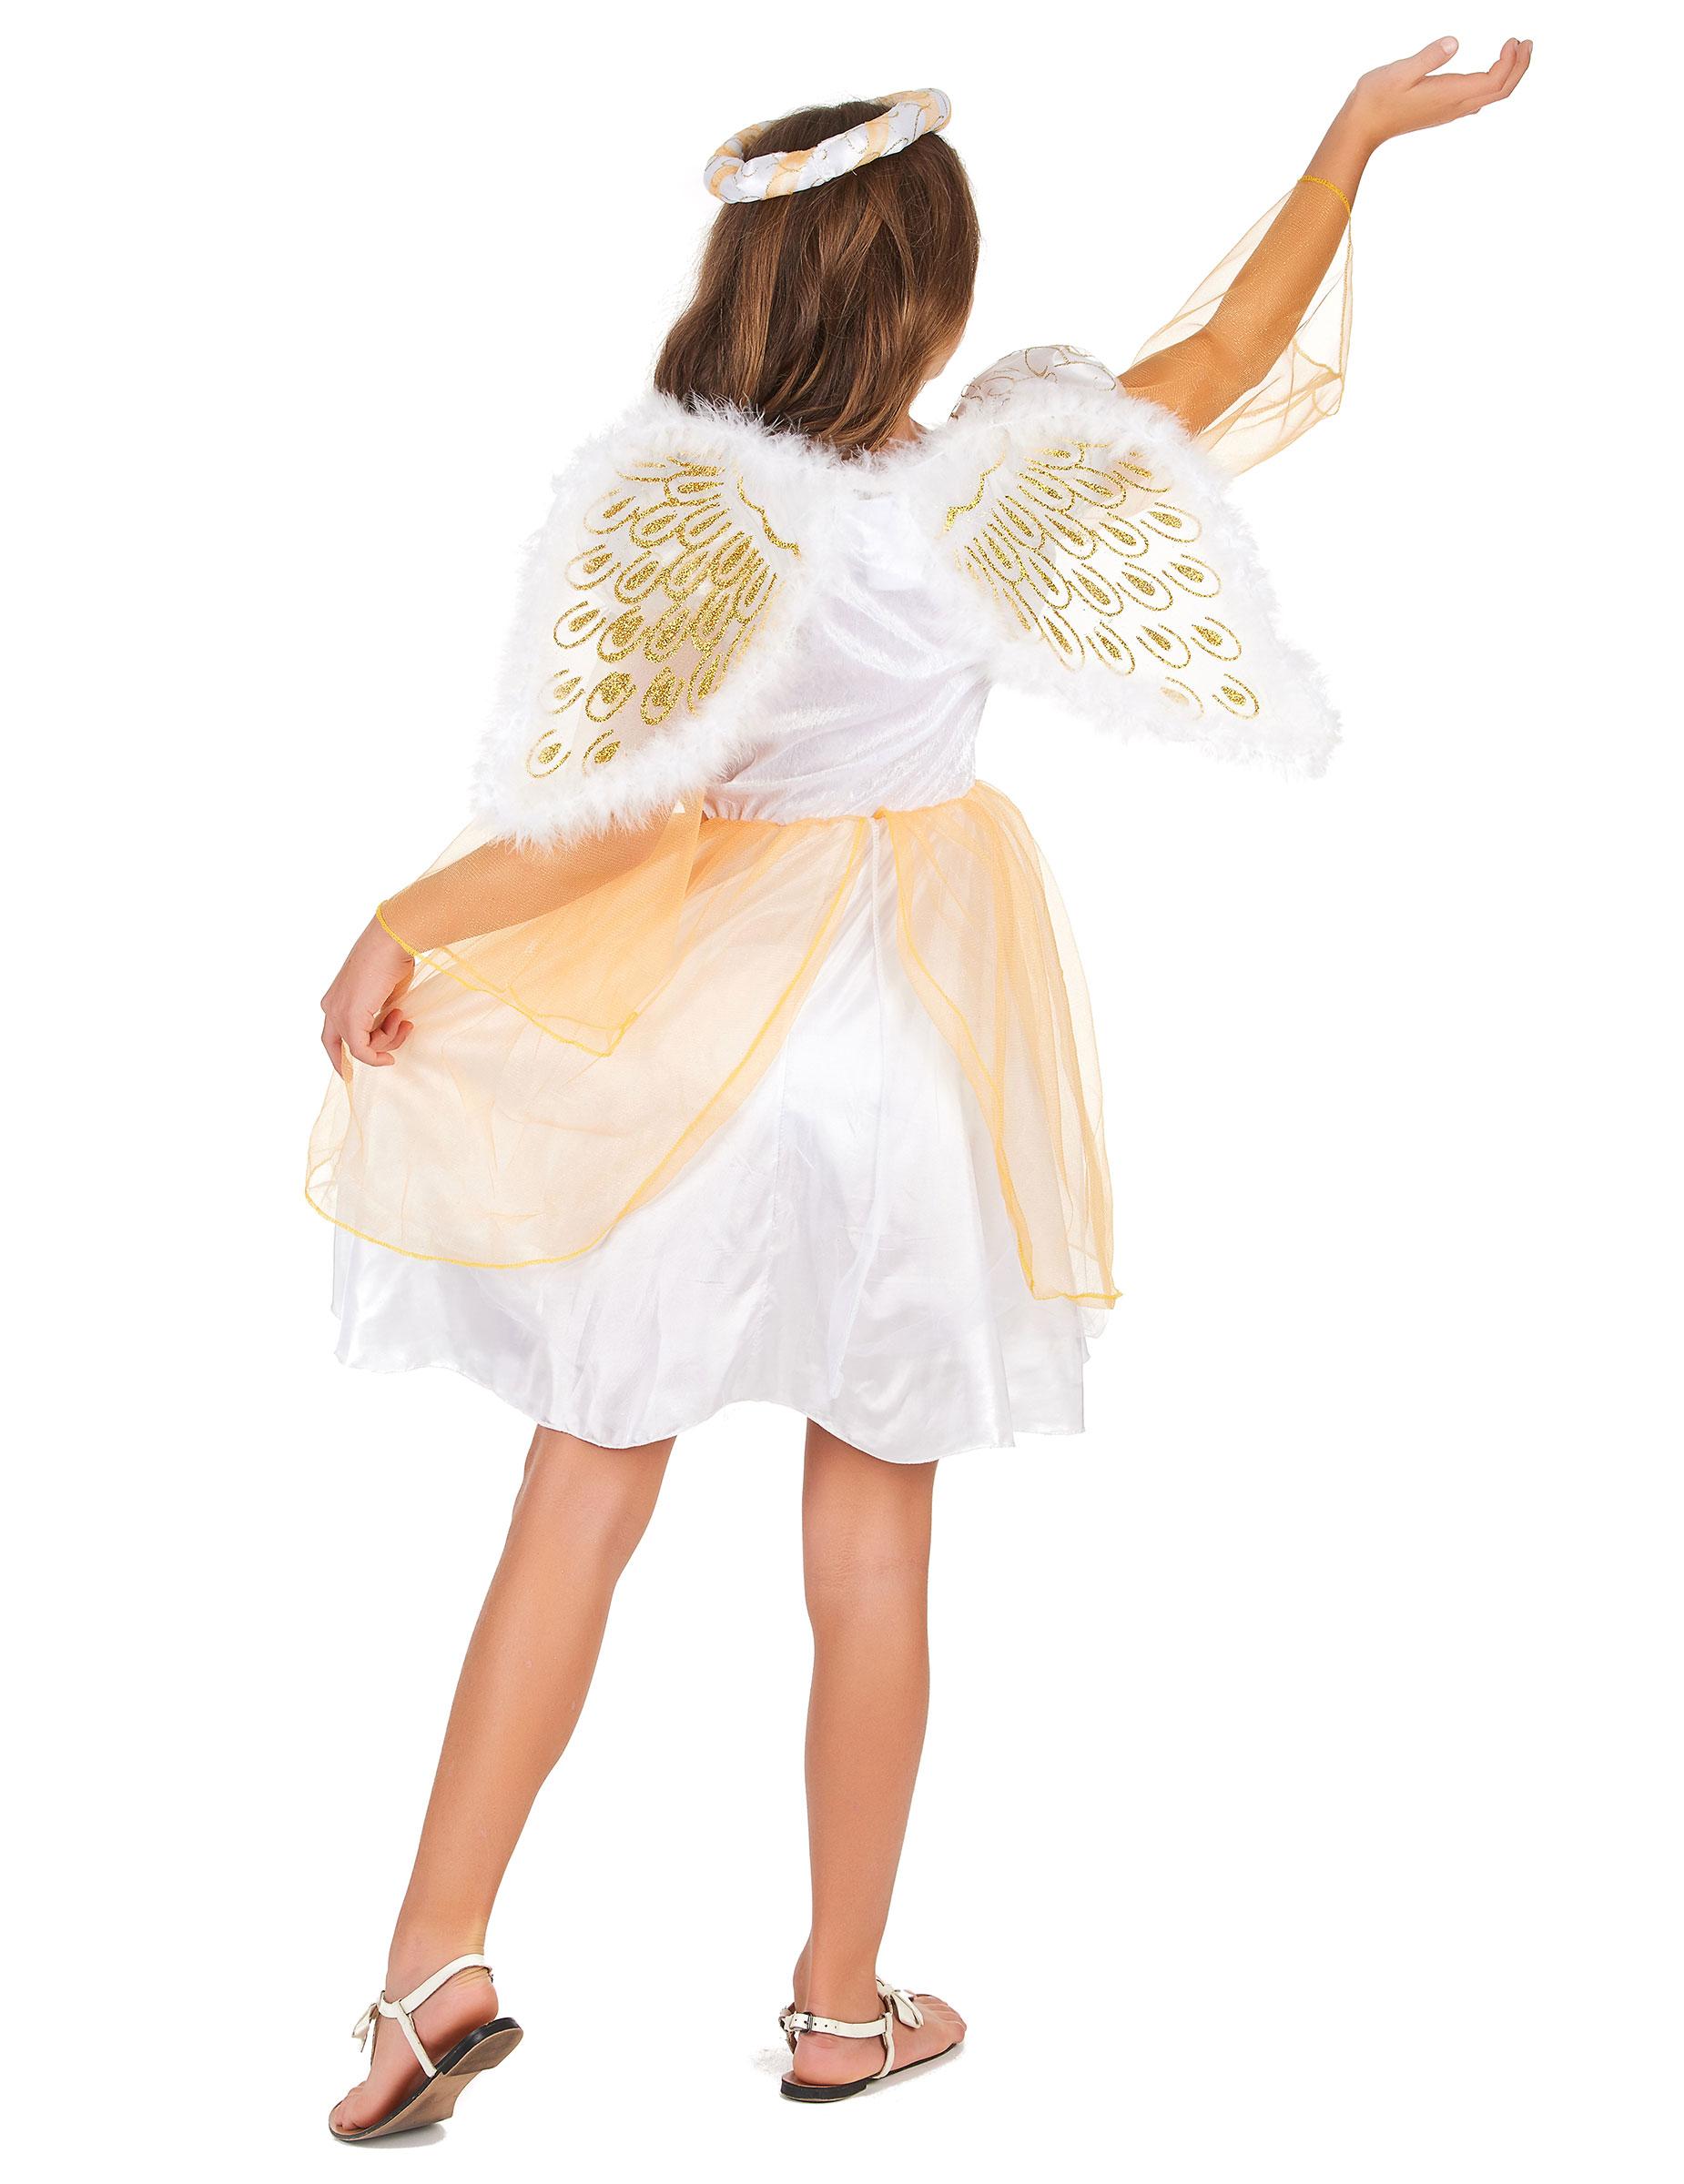 55bd0be45 Disfraz de ángel para niña